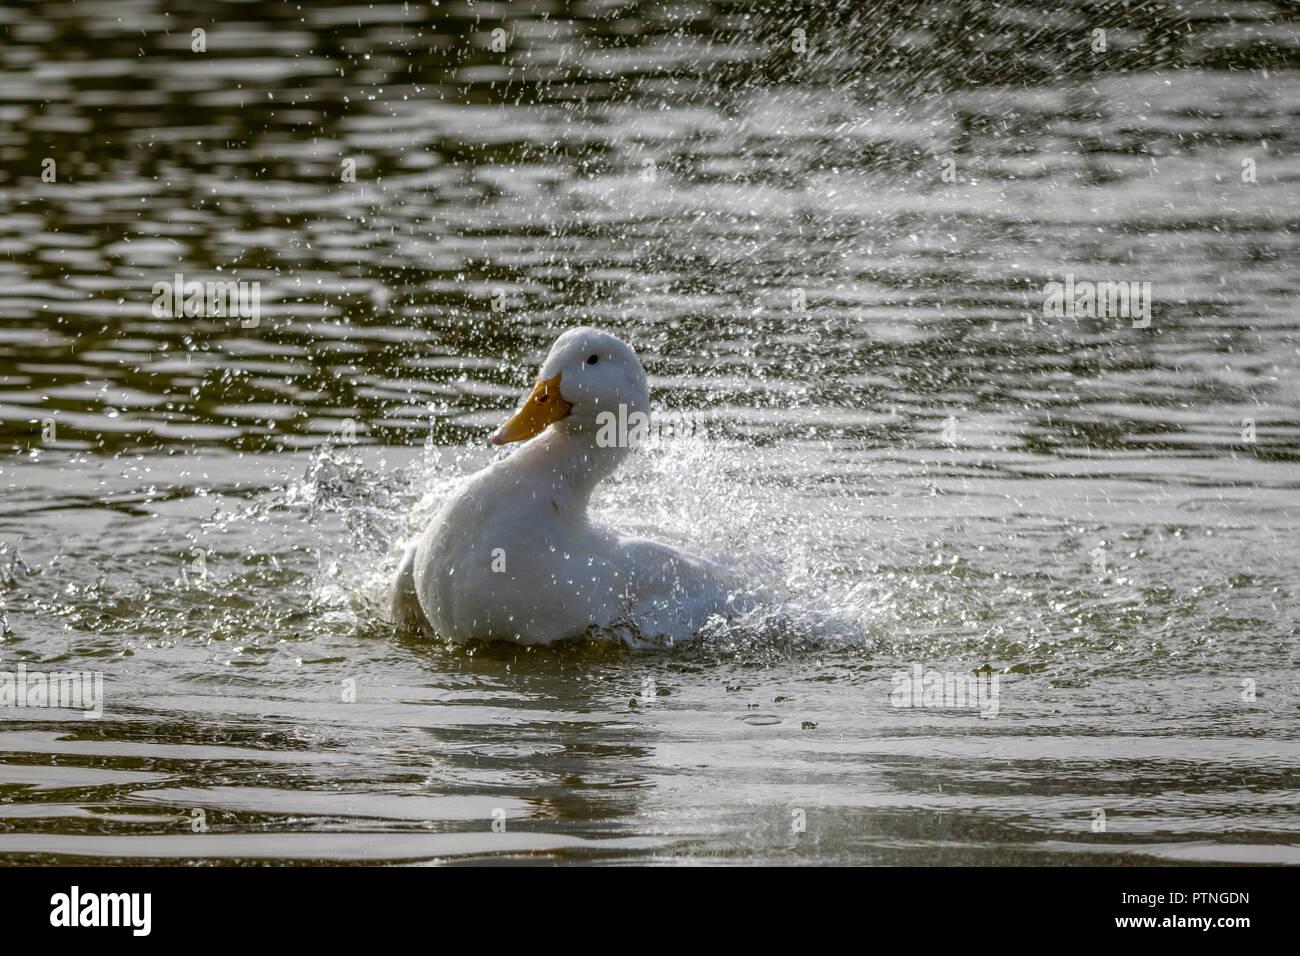 American Pekin Duck splashing about in water - Stock Image